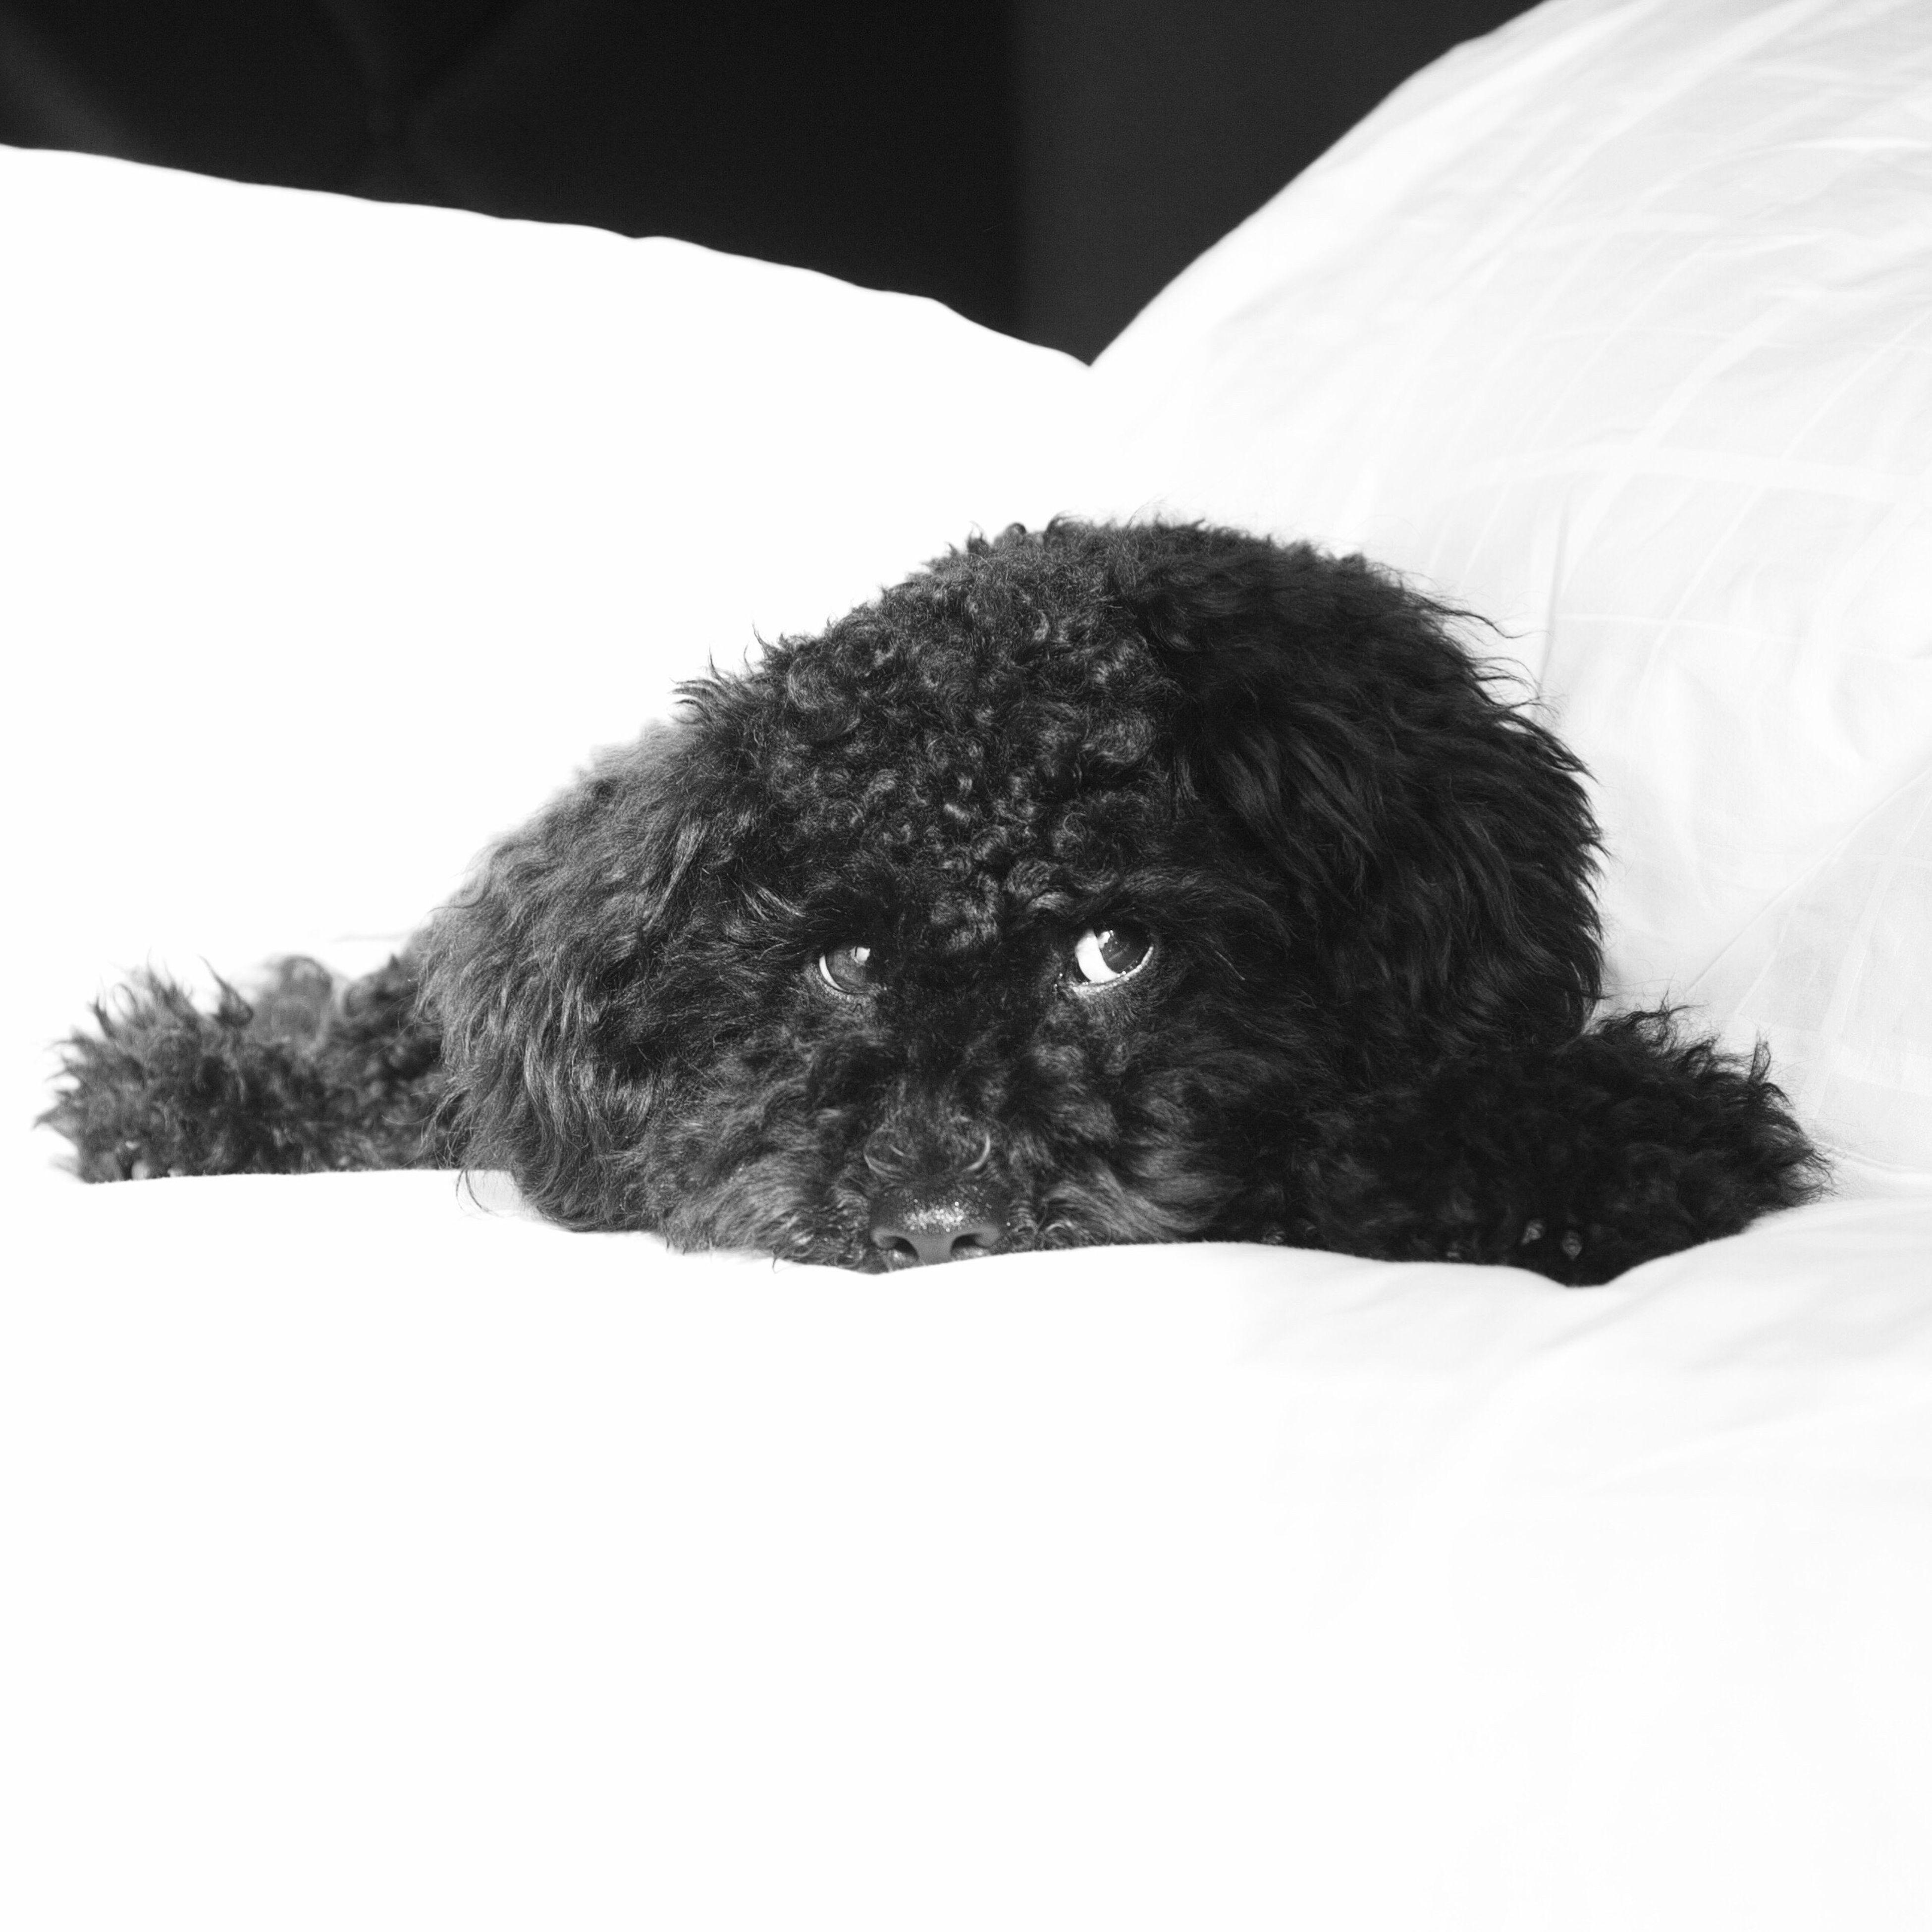 Toypoodle Toypoodles Toypoodlesofinstagram Poodle Poodle🐩 Dog Dogs Dog Love Dog❤ Dogs Of EyeEm Cute Pets Cute Dog  My Favorite Photo